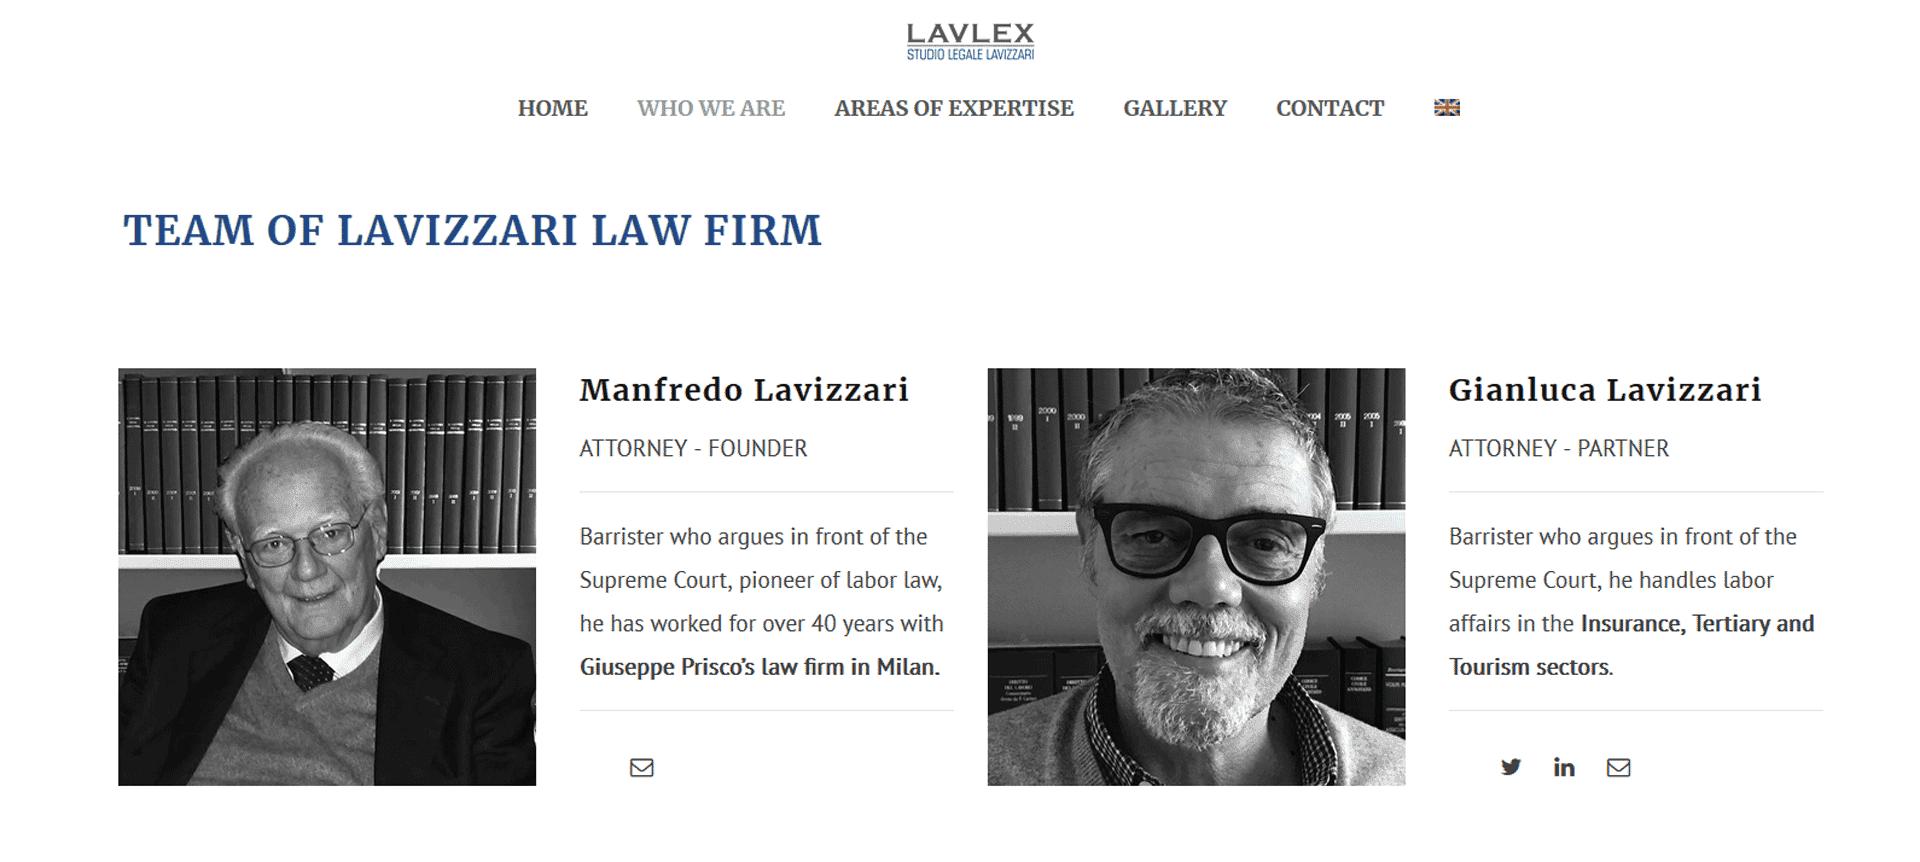 Lavlex Studio Legale Lavizzari Portfolio Digital Compass English